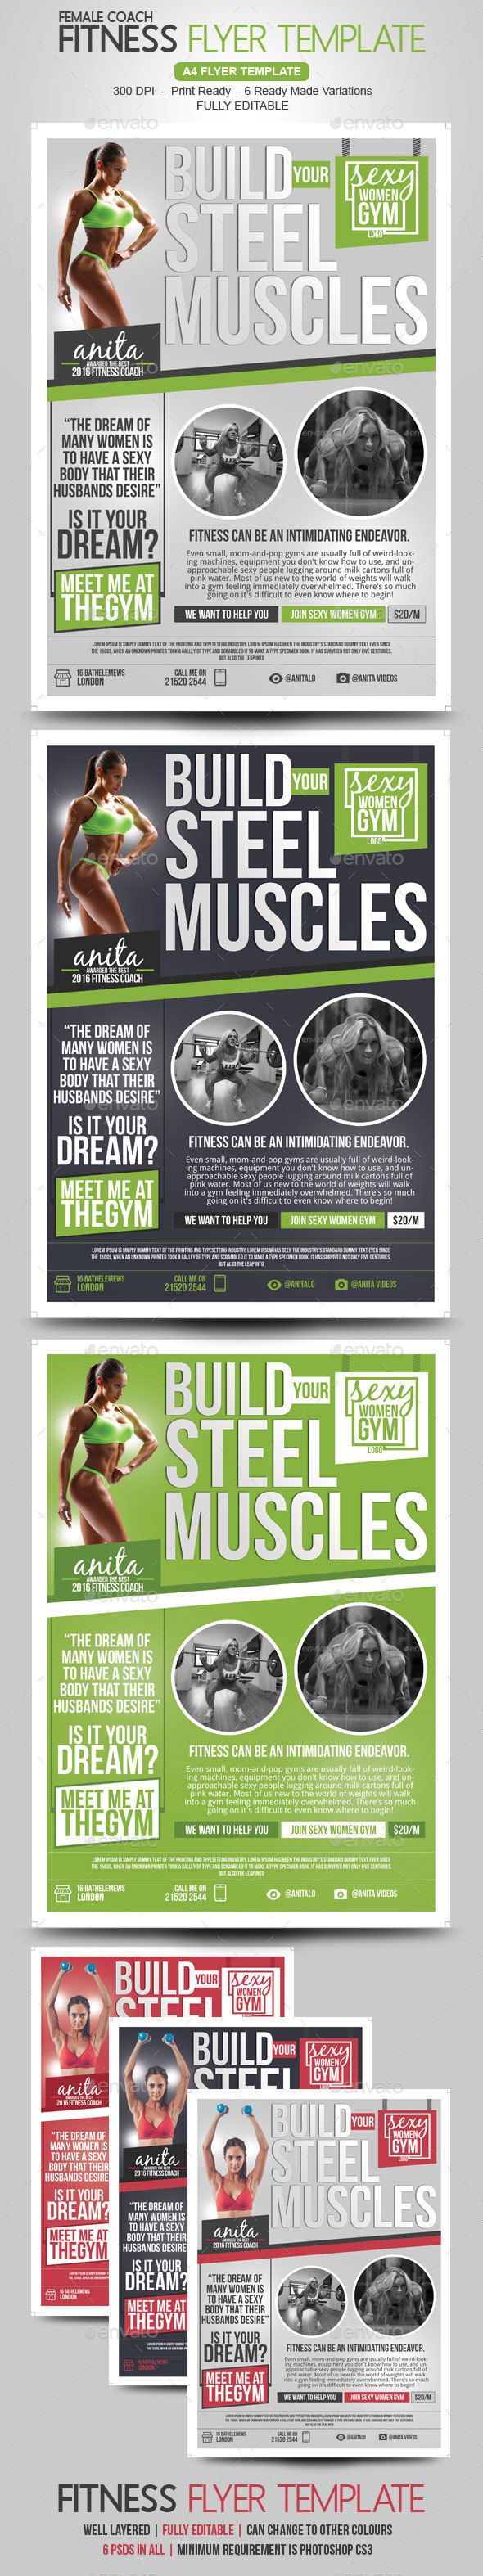 177 best Marketing Flyers images – Marketing Flyer